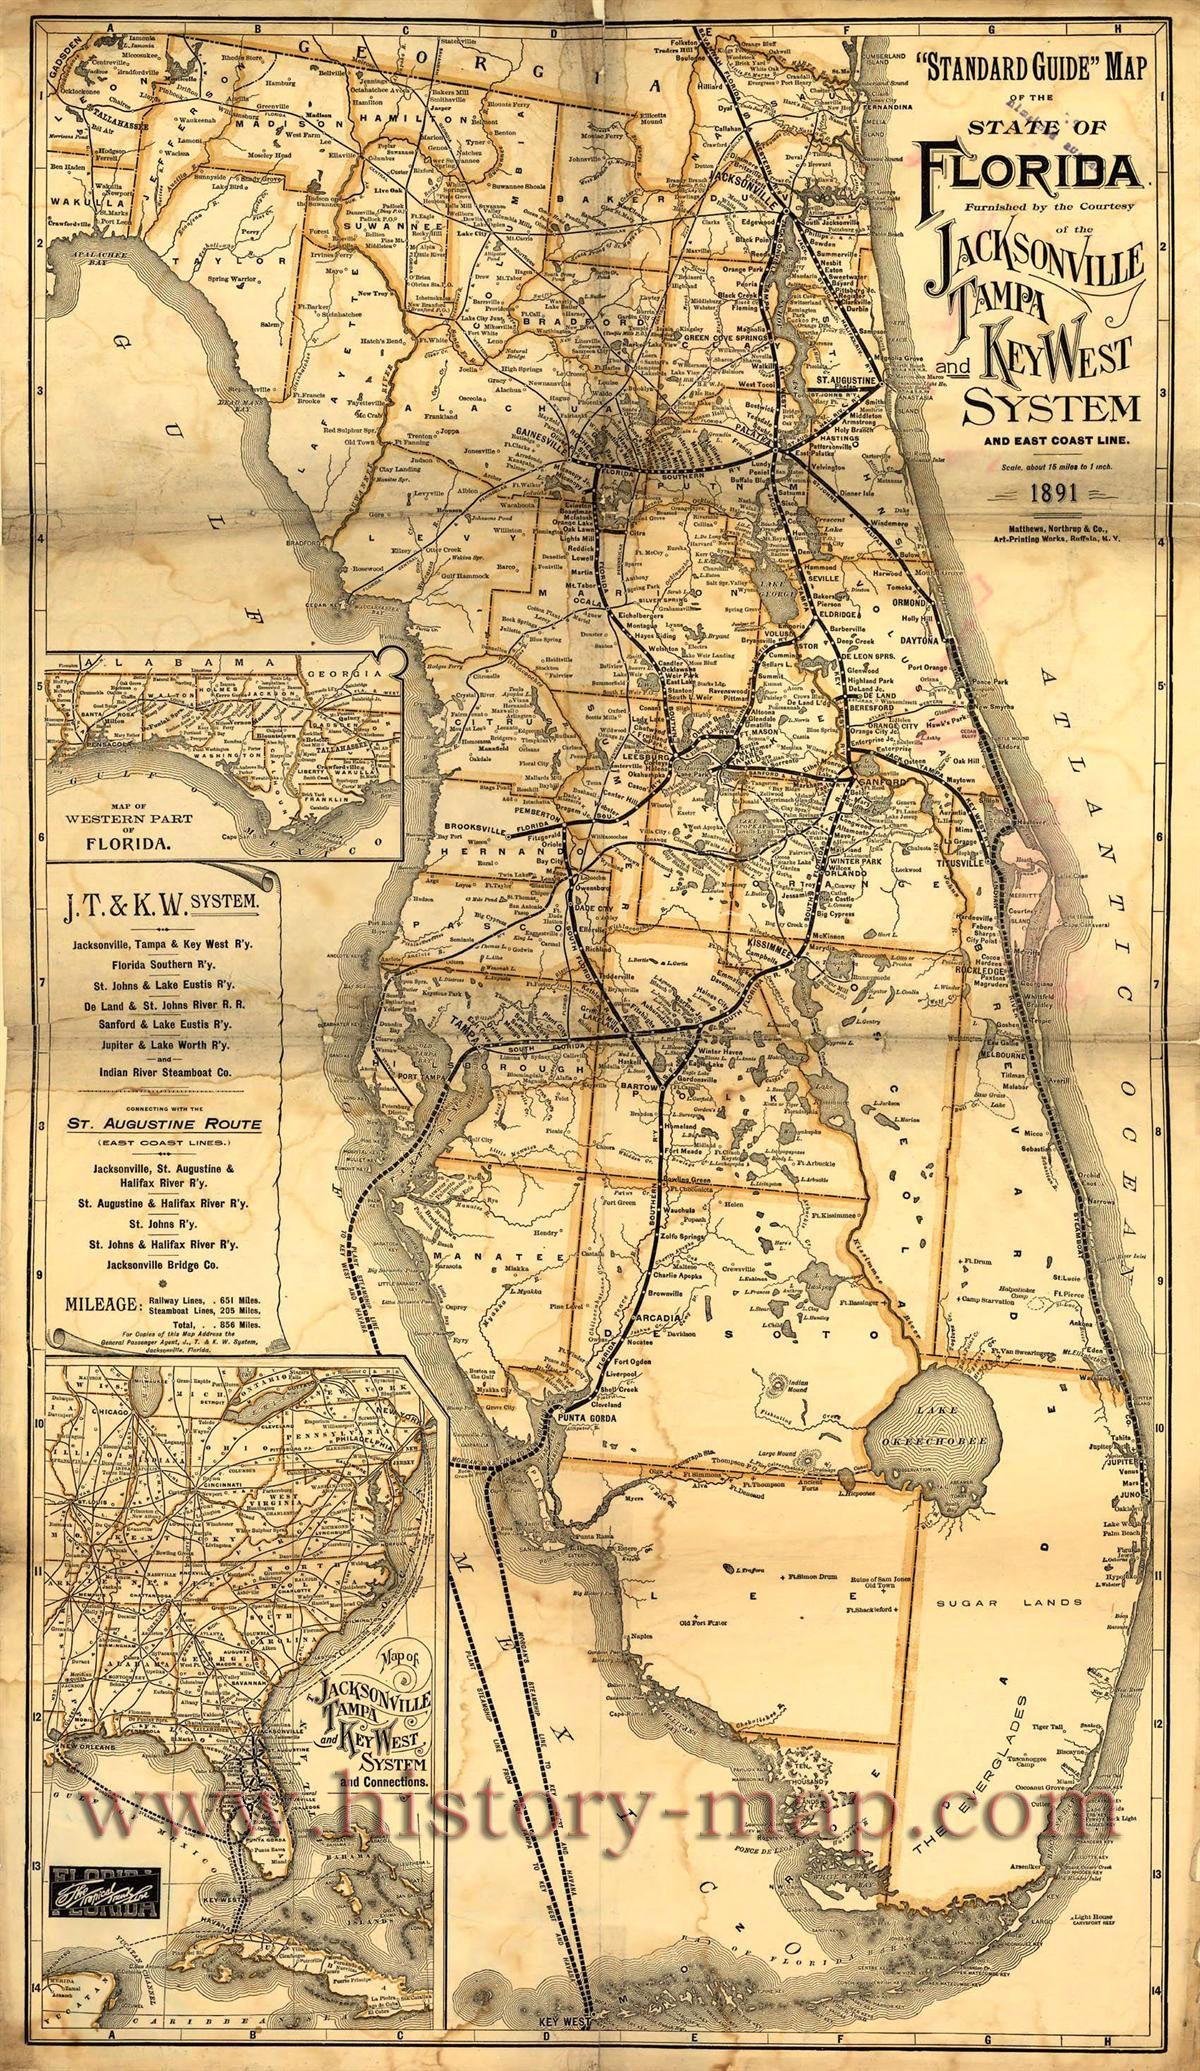 Florida | Florida In 2019 | Pinterest | Vintage Florida, Old Florida - Vintage Florida Map Poster